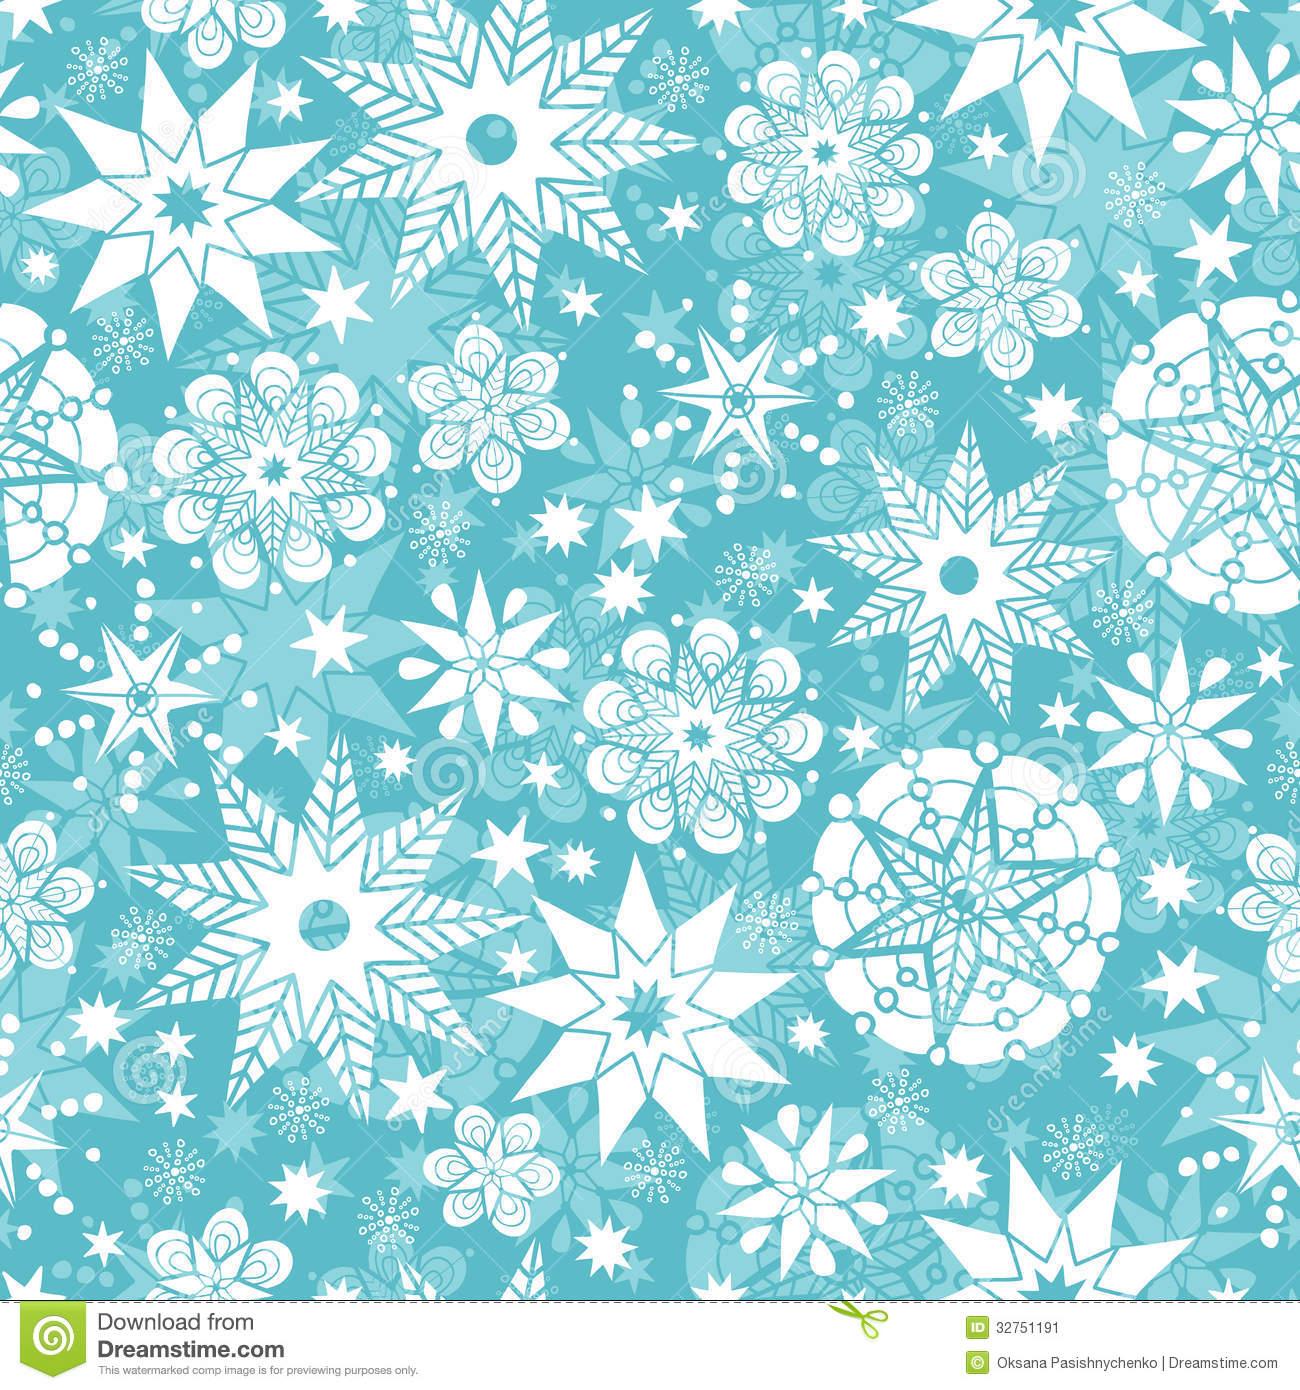 Decorative Snowflake Frost Seamless Pattern Stock Image.